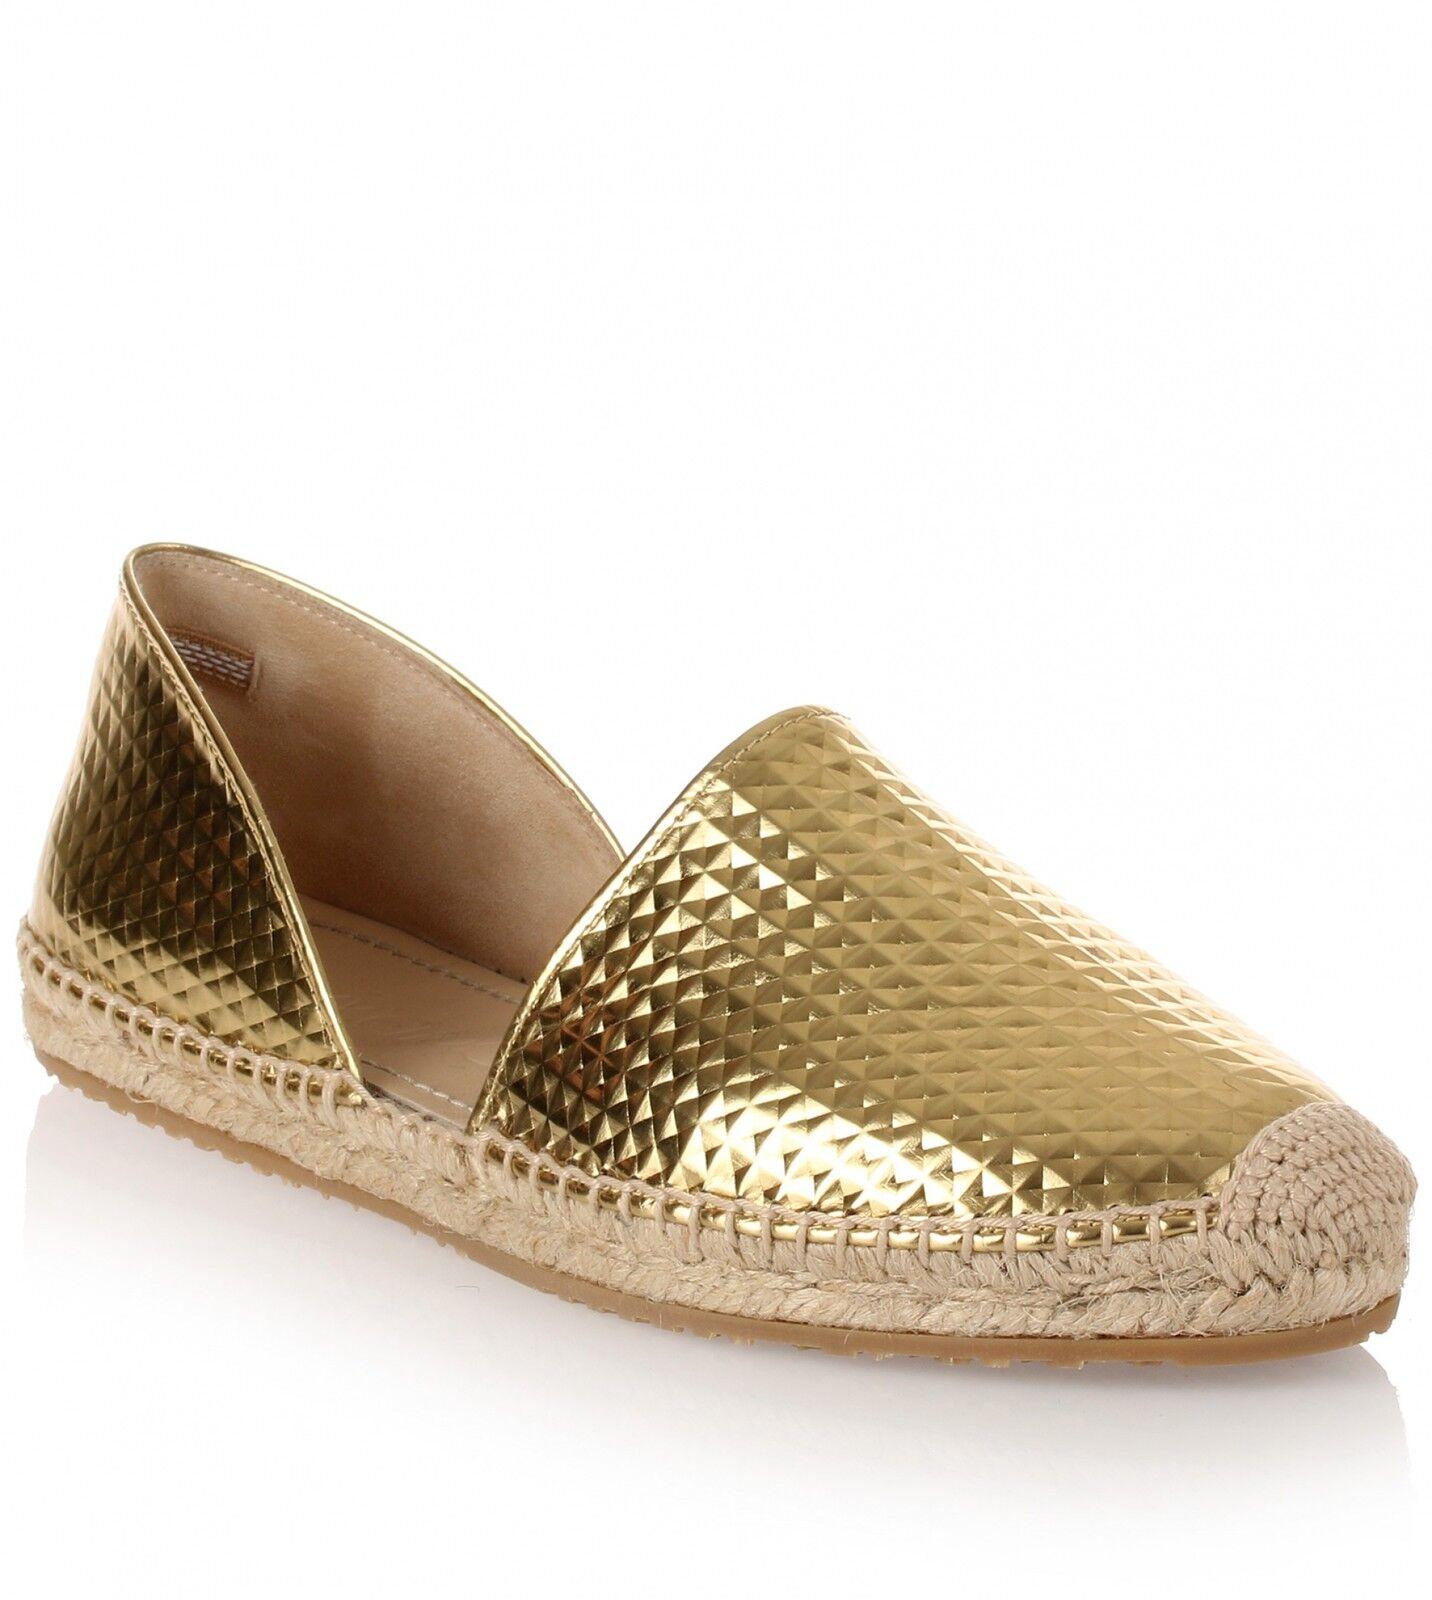 prezzo ragionevole Jimmy Choo Dreya Dorado Dorado Dorado Cubos Espejo Cuero Alpargatas scarpe bajo 36.5  solo per te